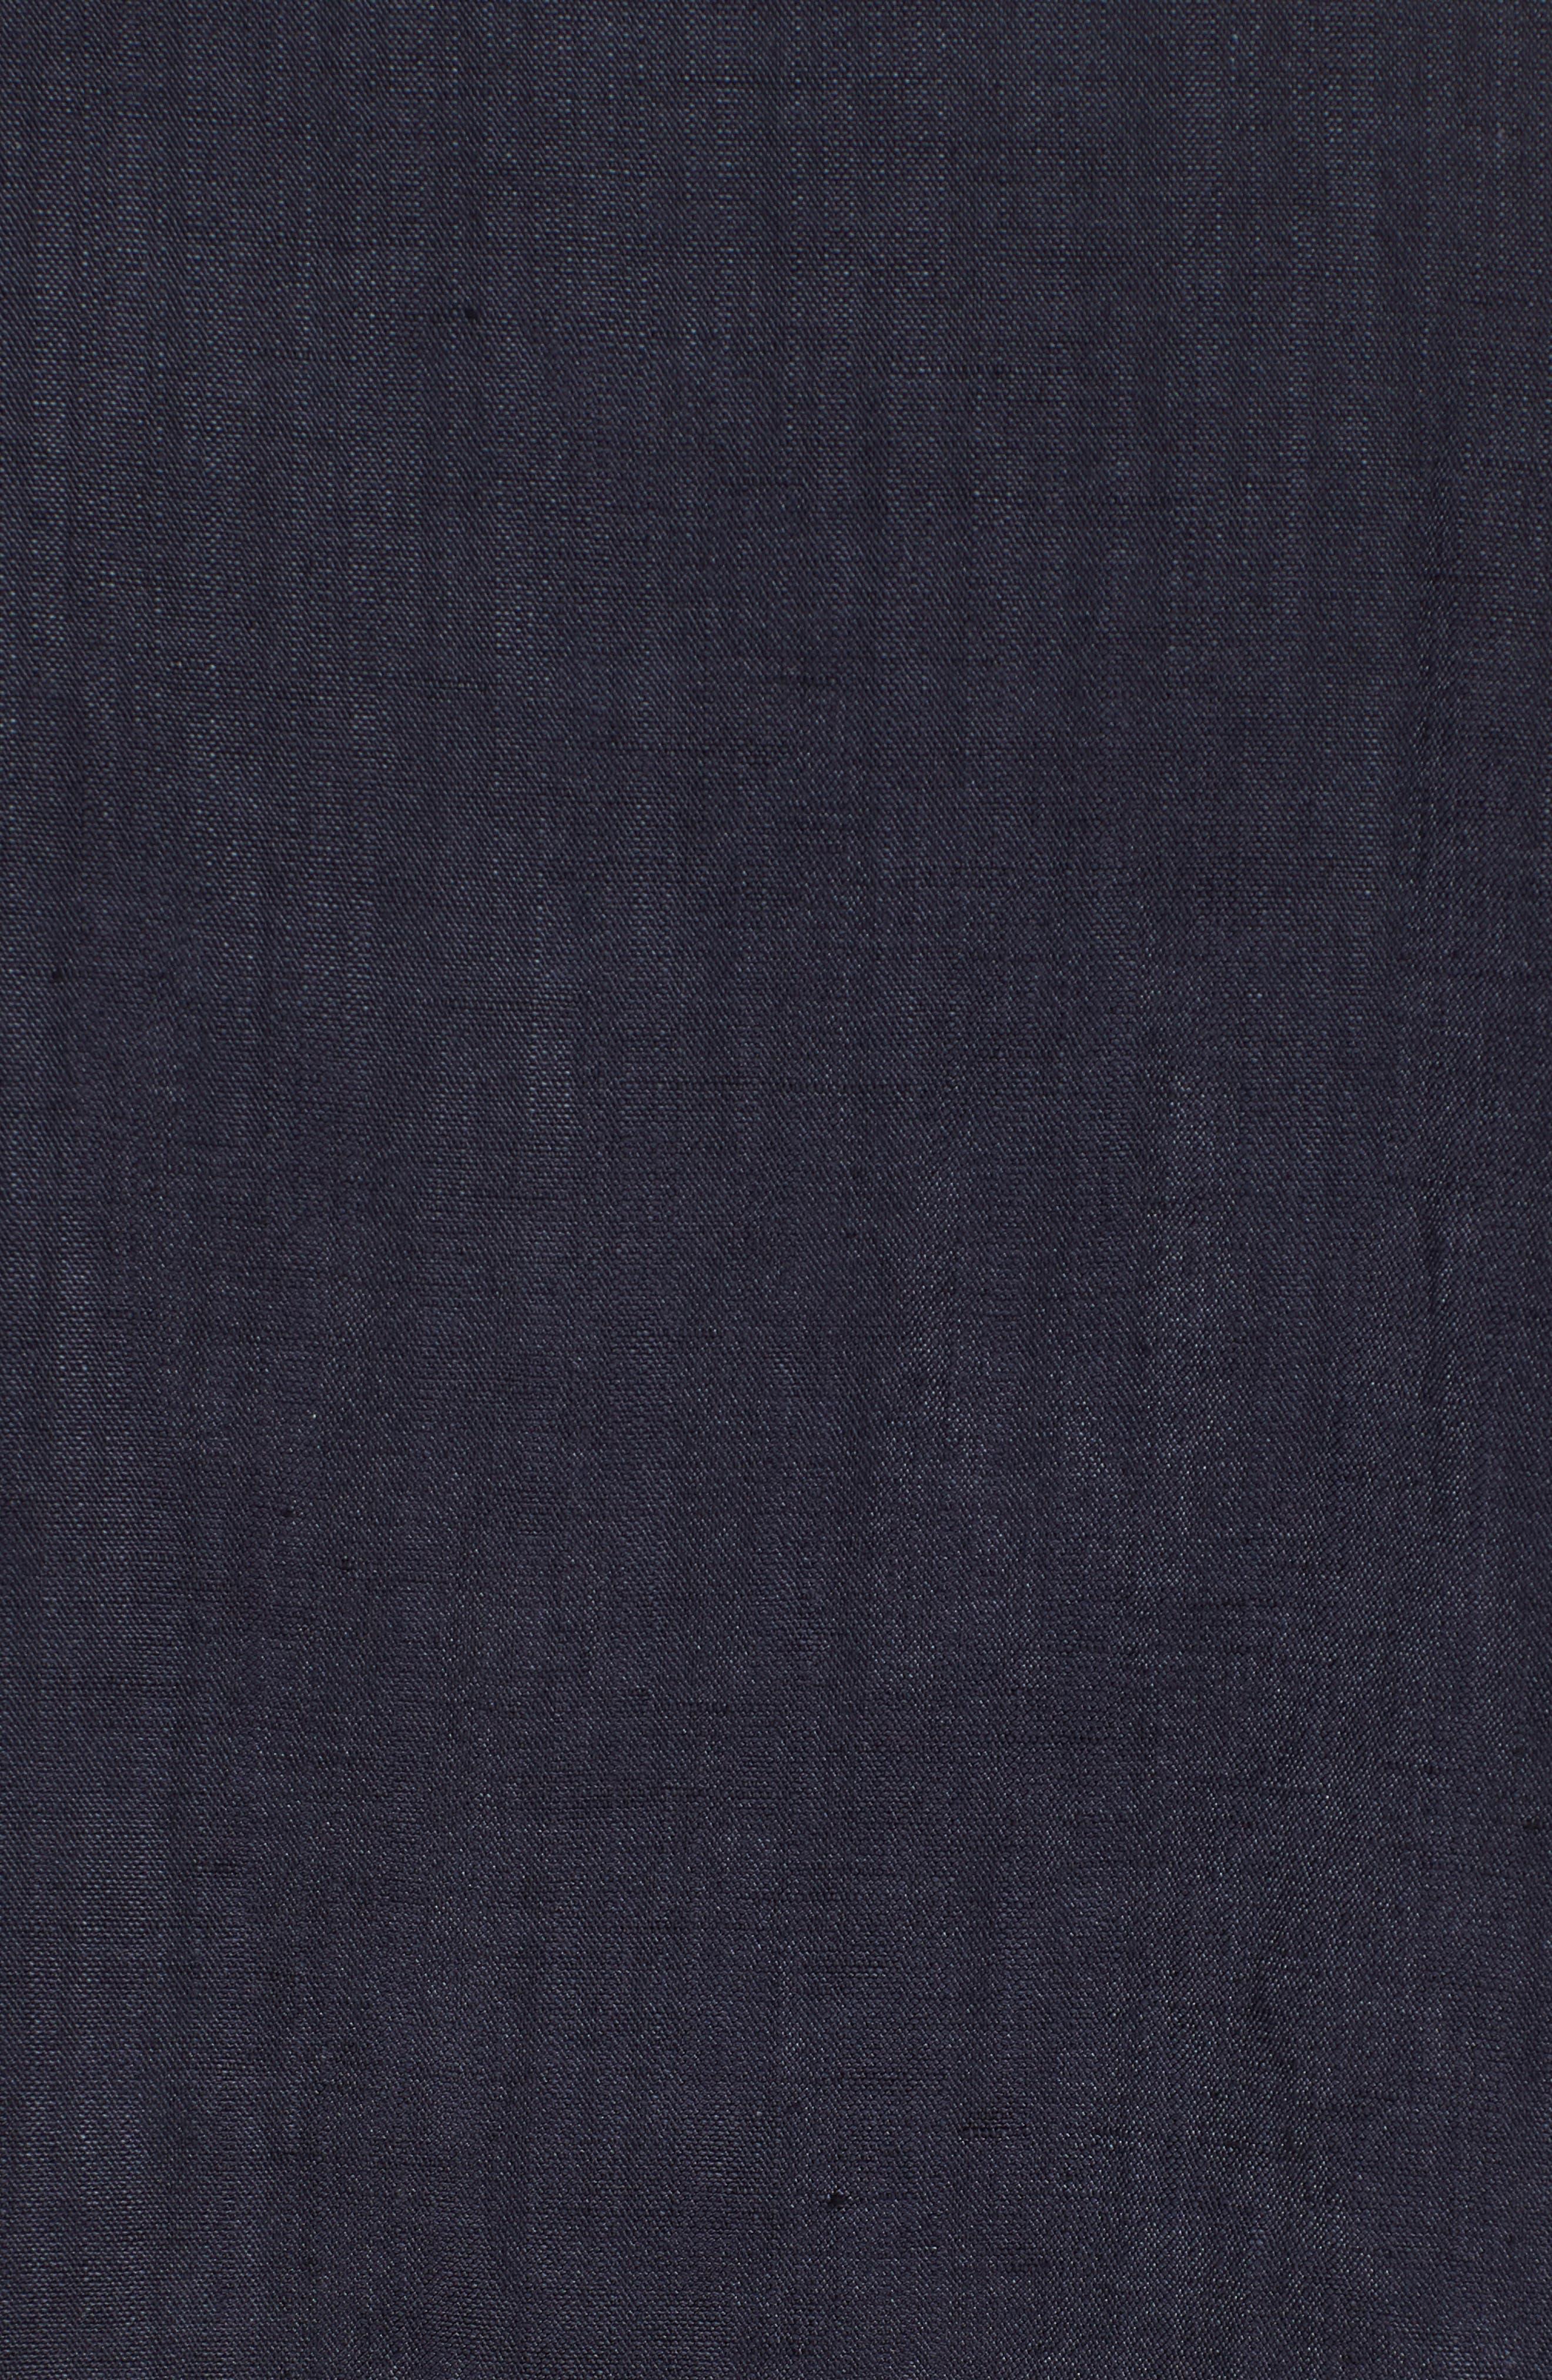 Halifax Drawstring Jacket,                             Alternate thumbnail 7, color,                             NAVY